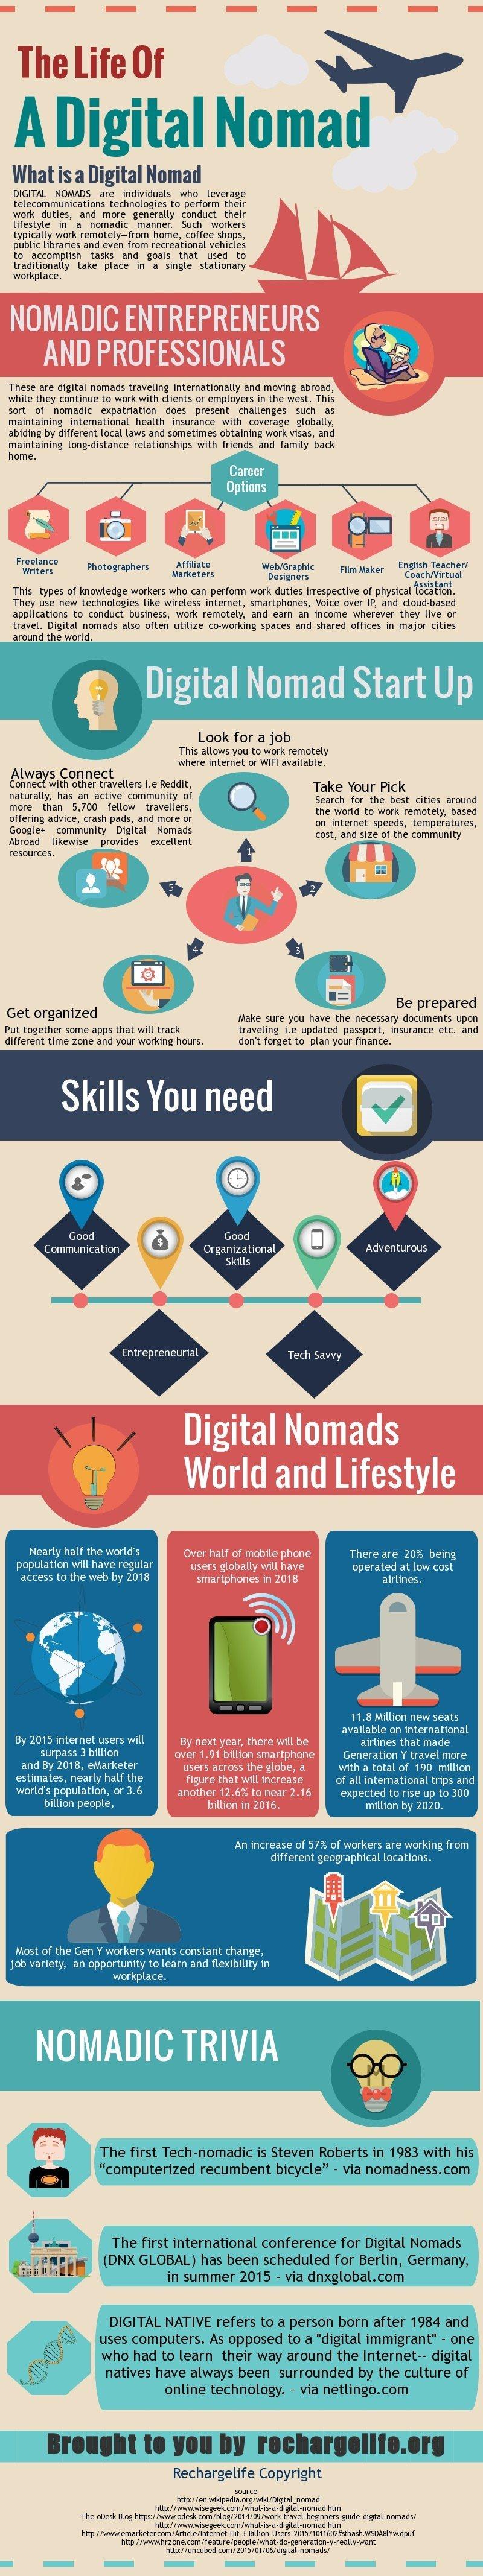 The Life of Digital Nomad RL